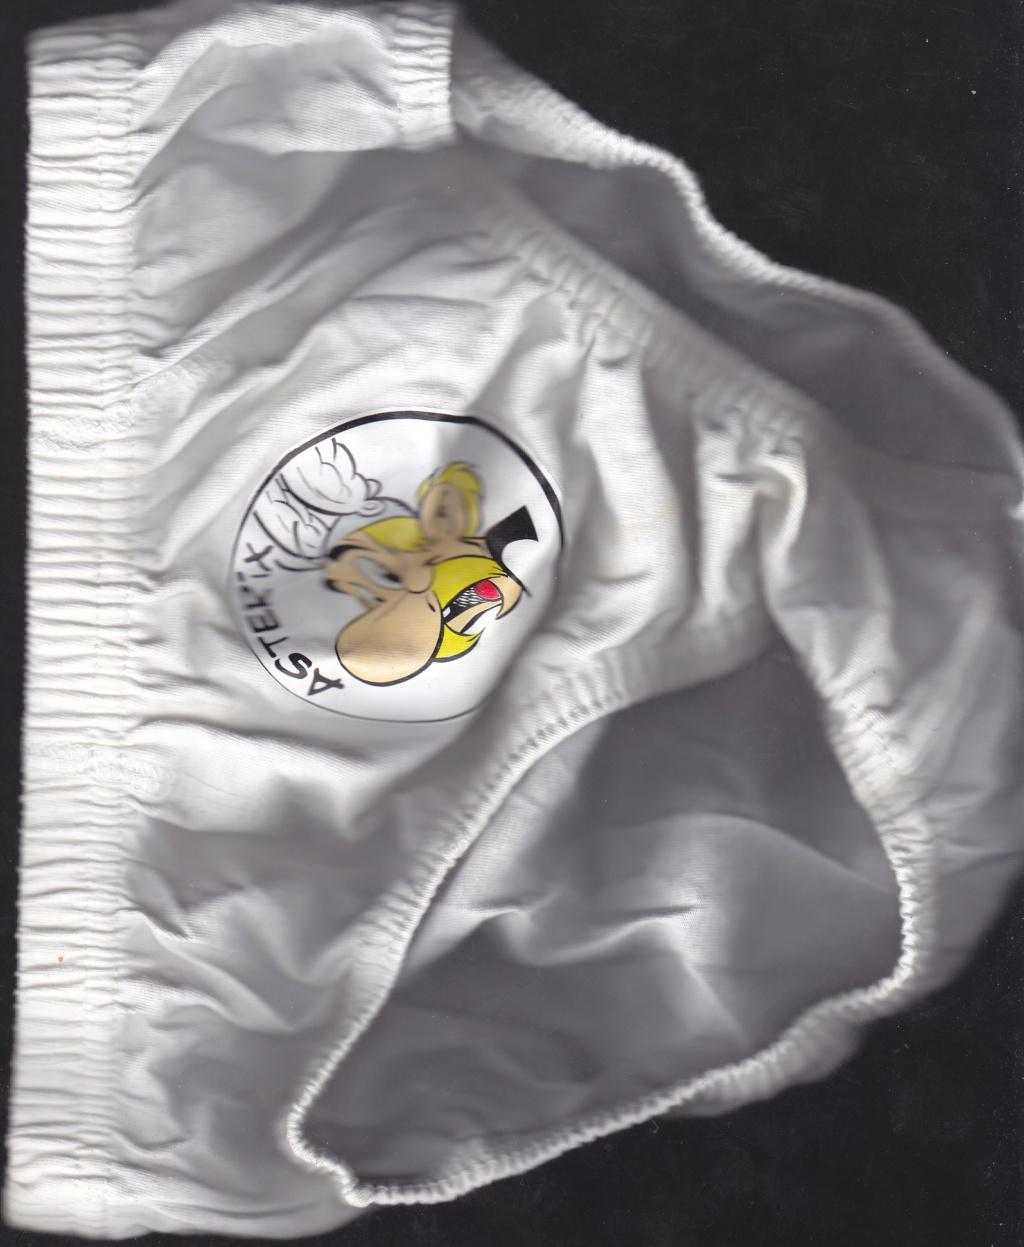 2003_s11.jpg